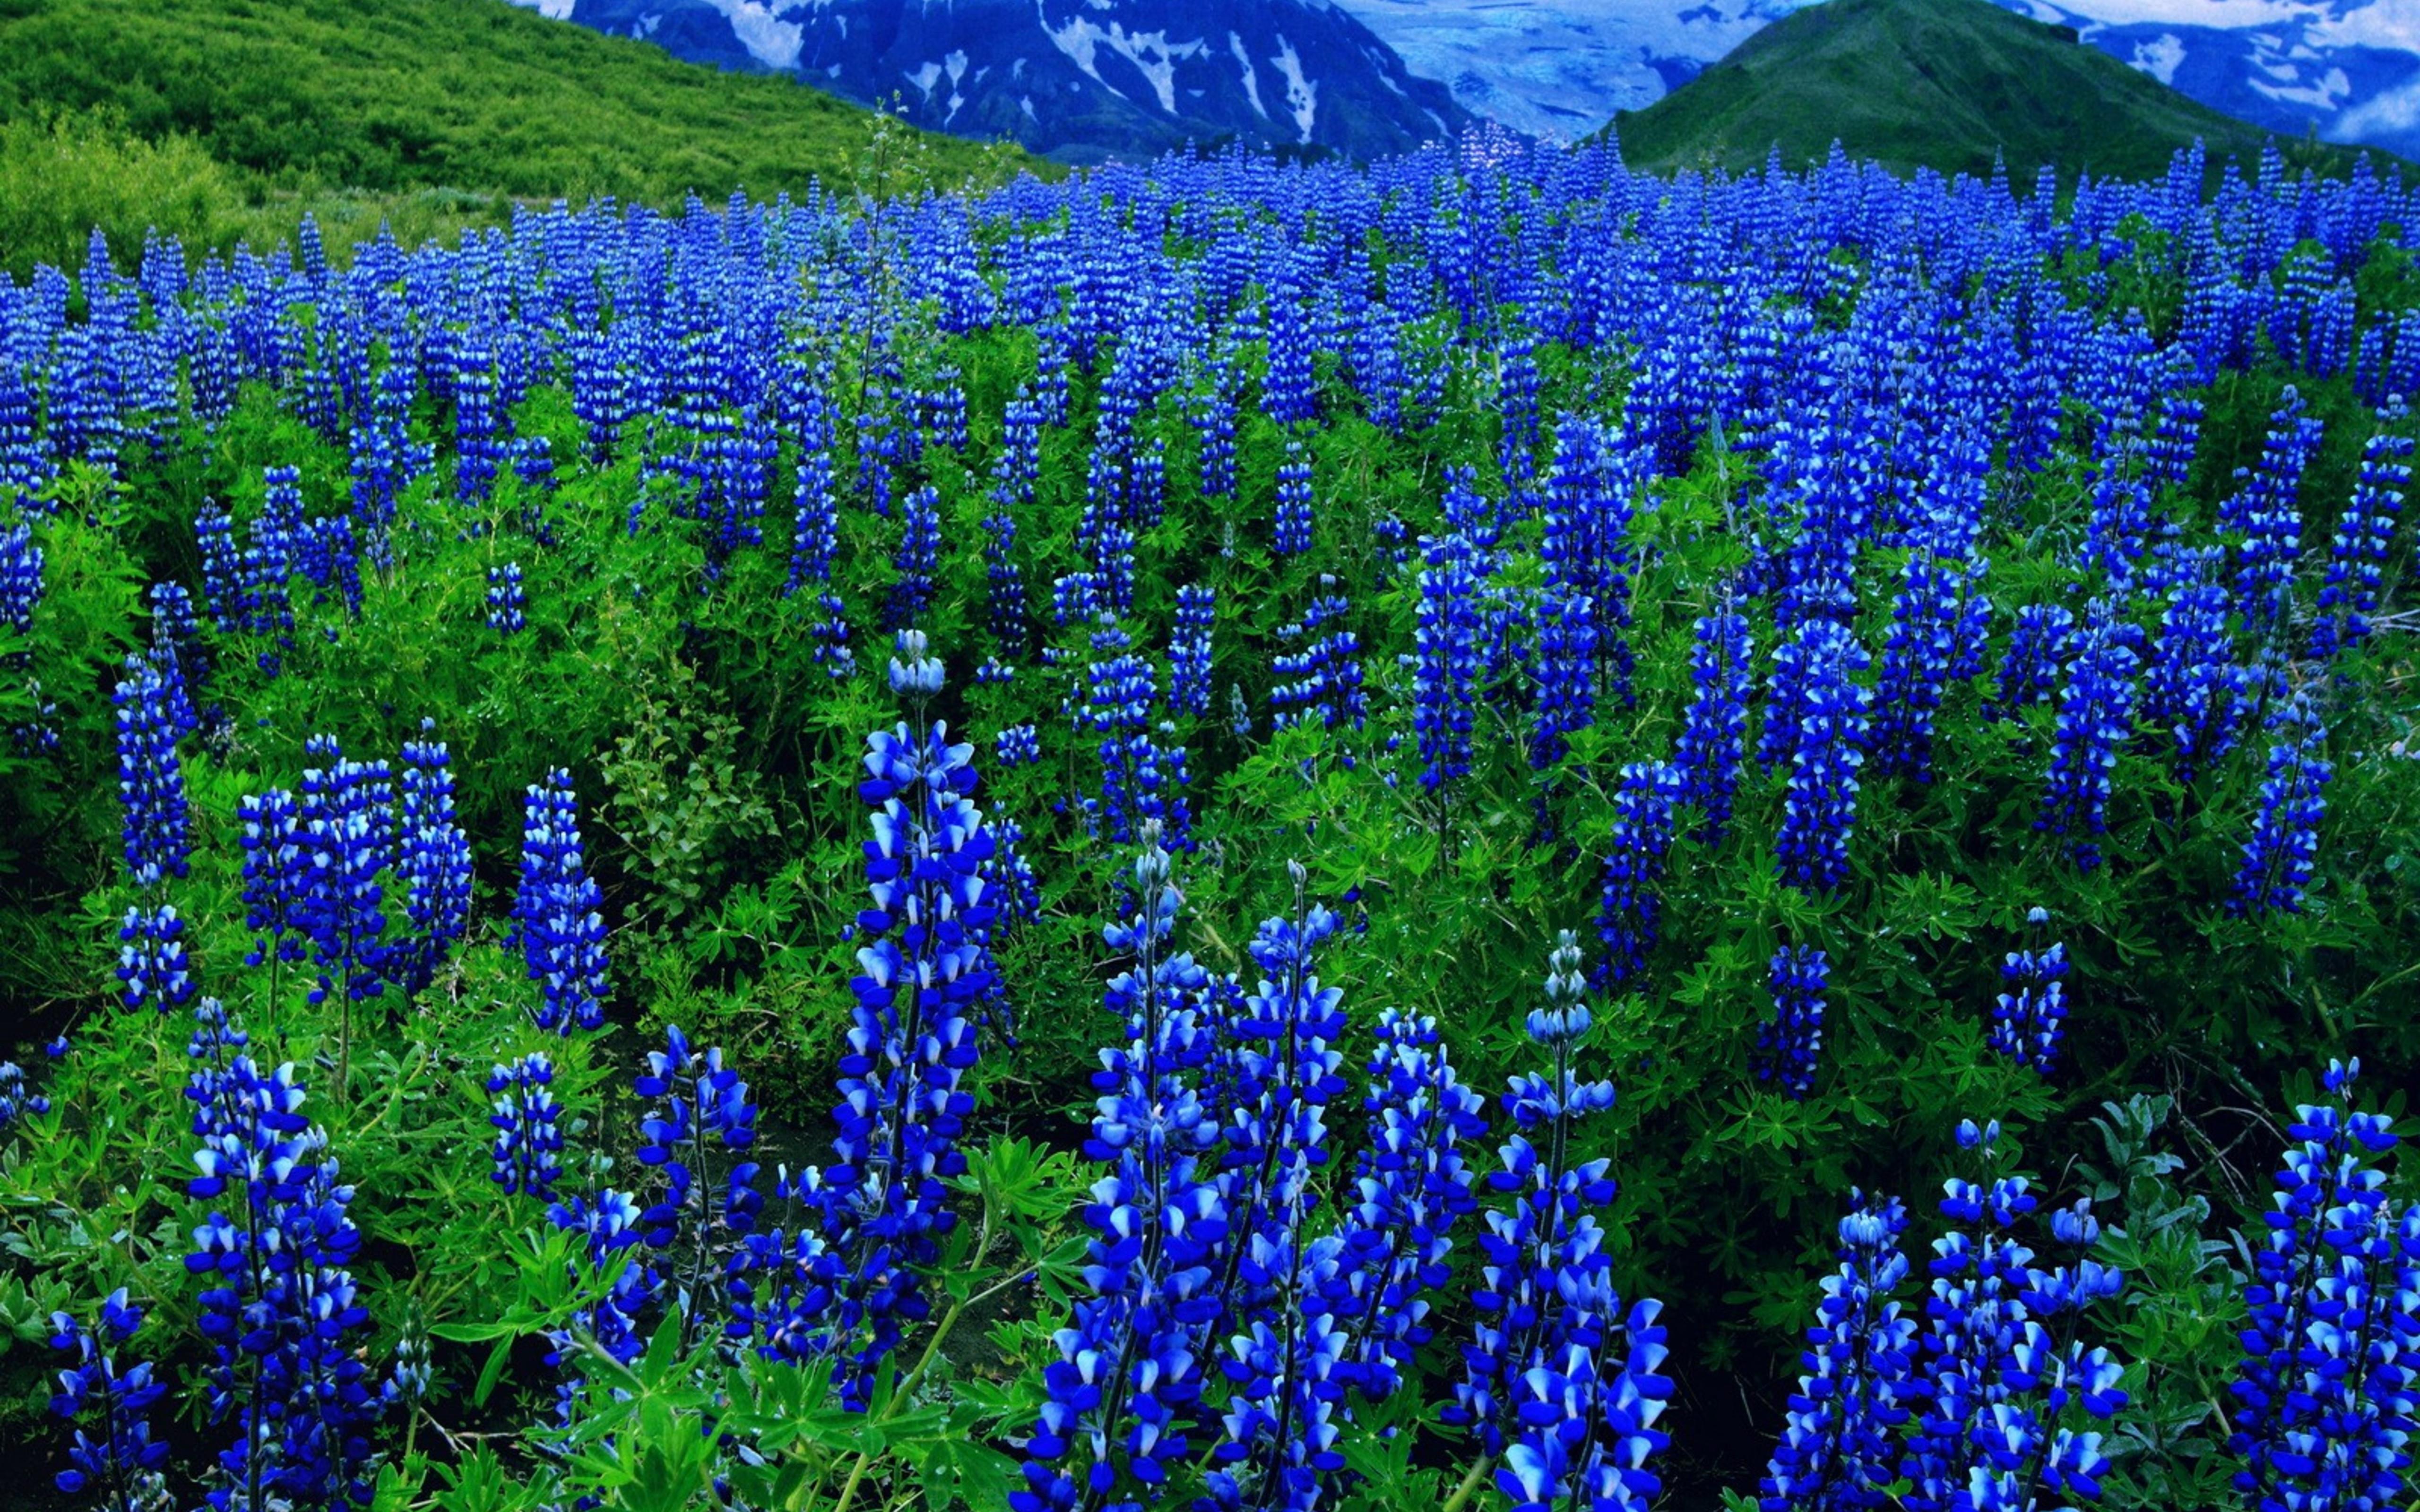 Free photo: Blue flowers - Blooming, Blue, Flowers - Free ...